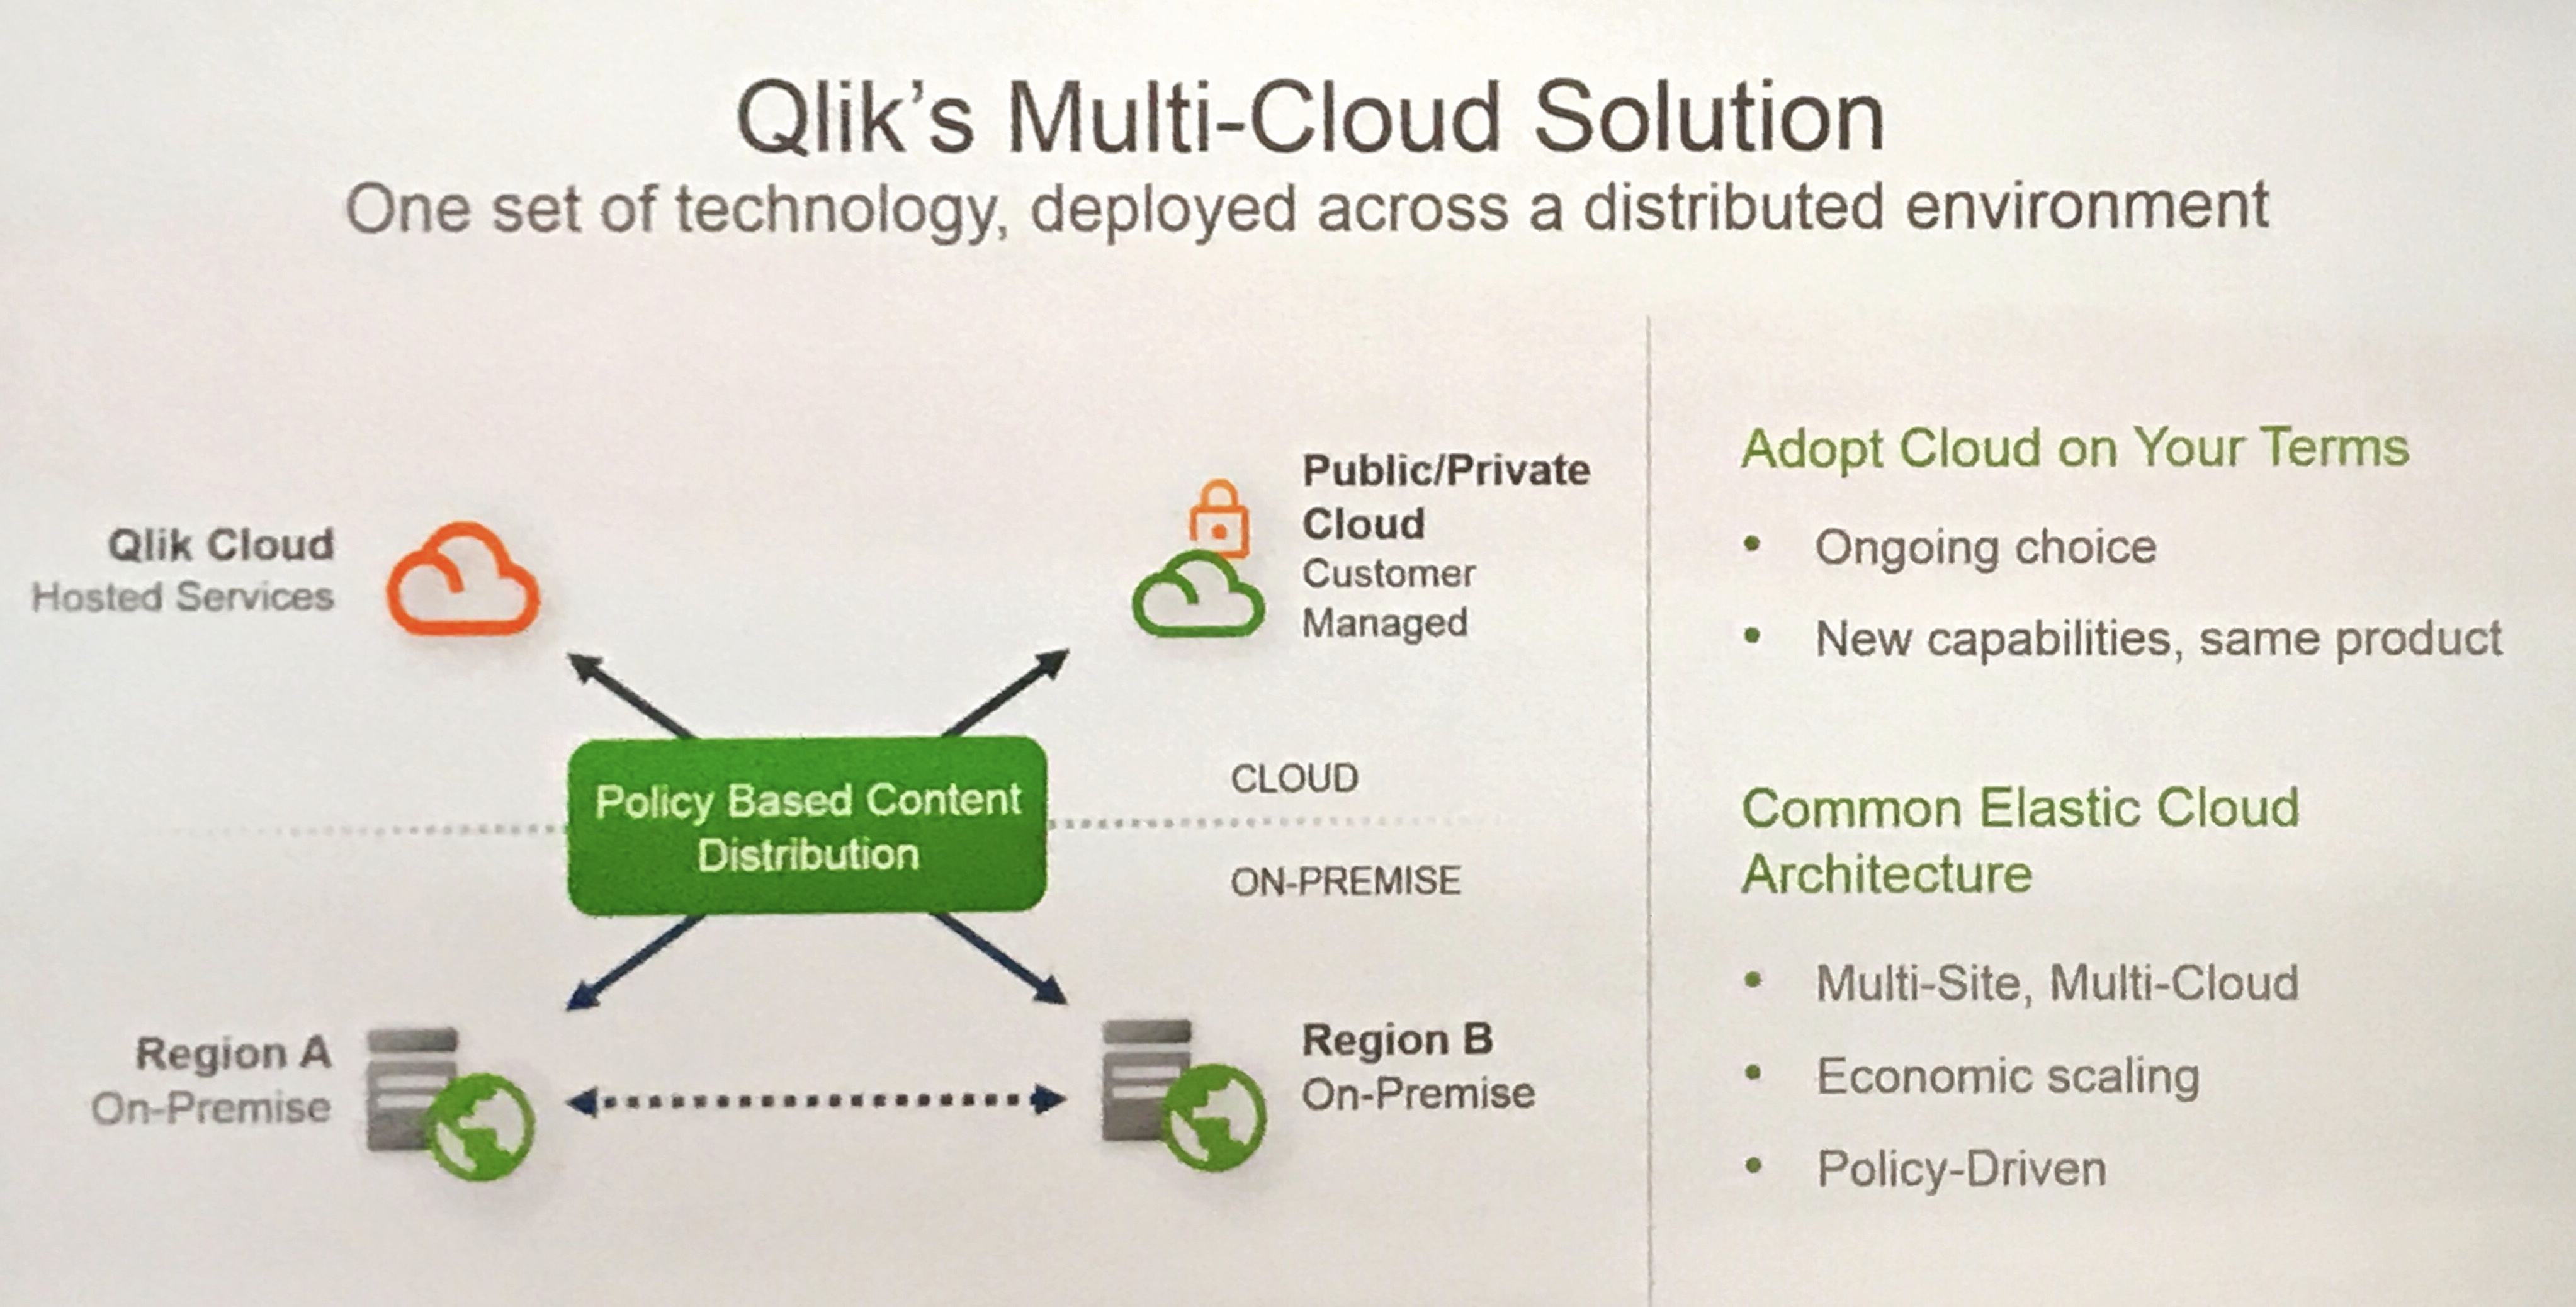 Qlik Hits Reset Button, Rolls Out New Cloud, AI & Developer